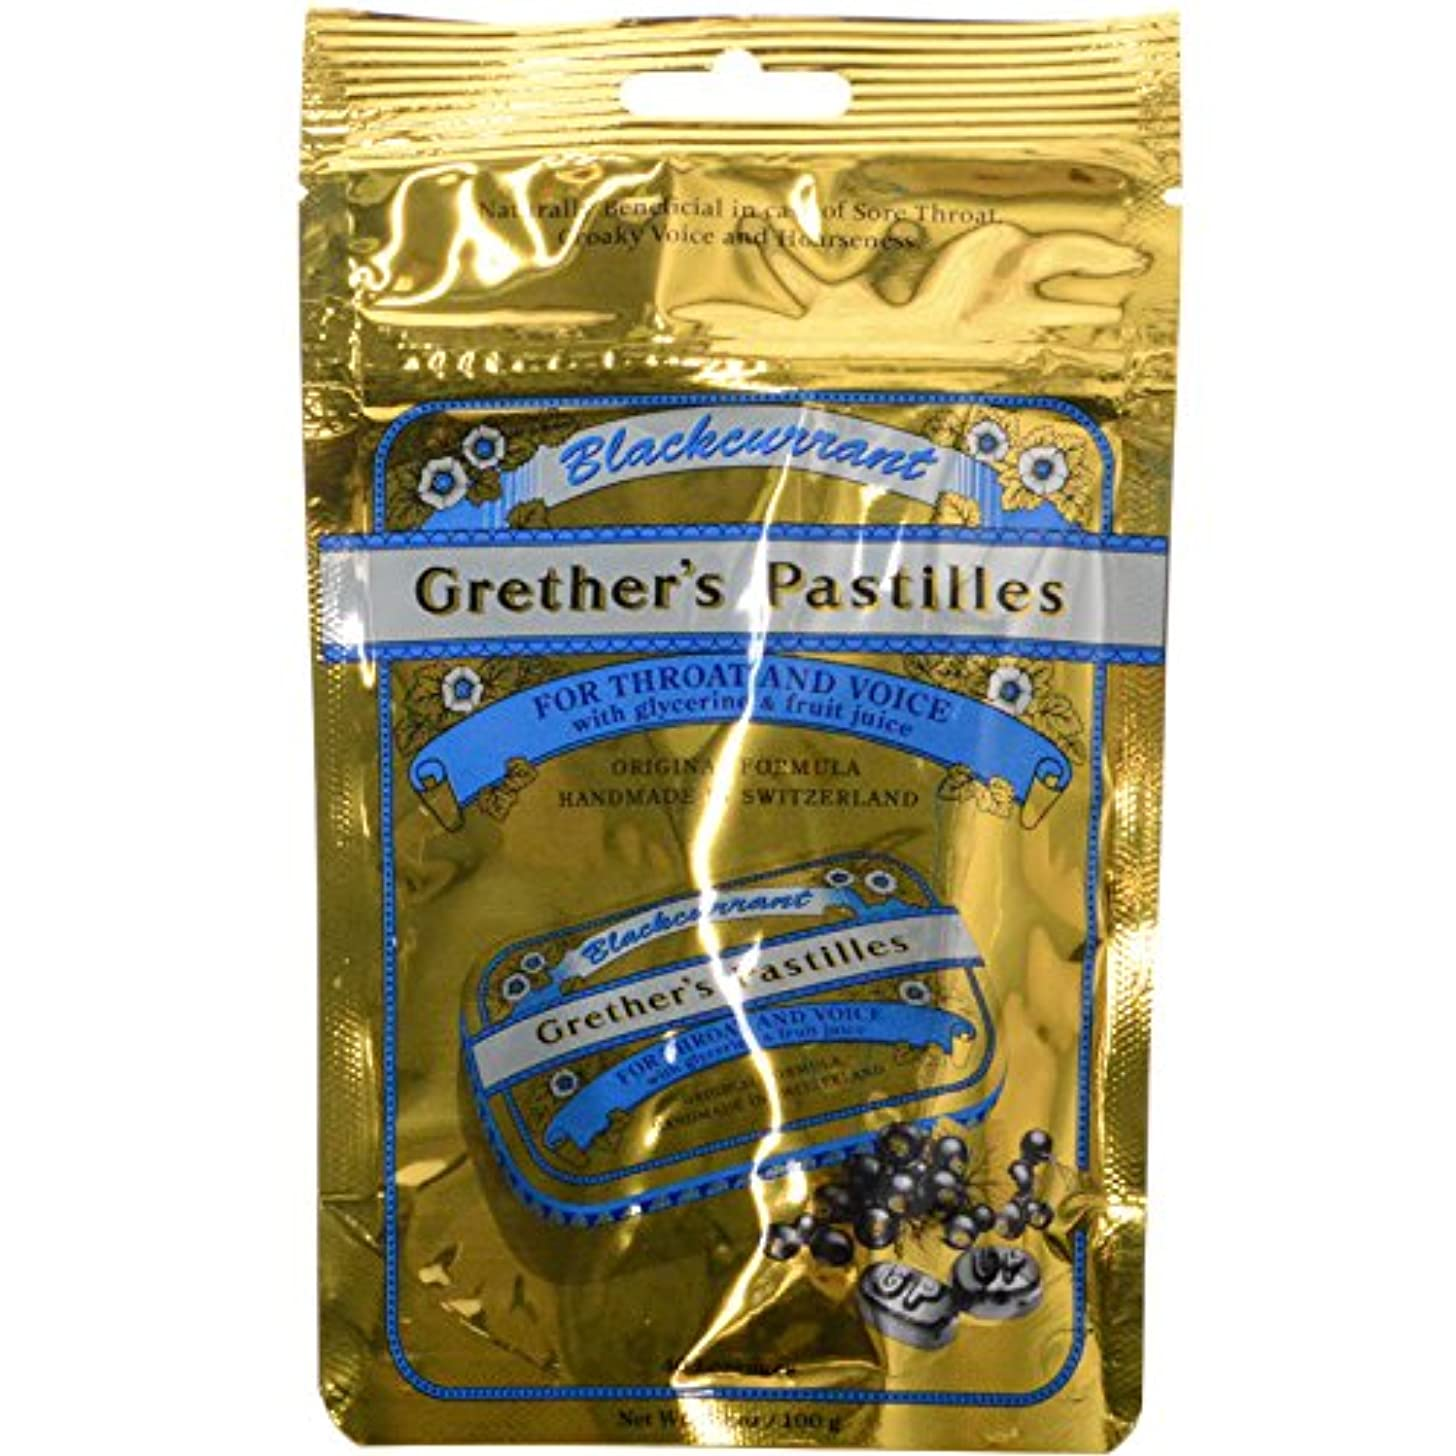 Blackcurrant 3.4 oz by Grether's Pastilles (Normal)